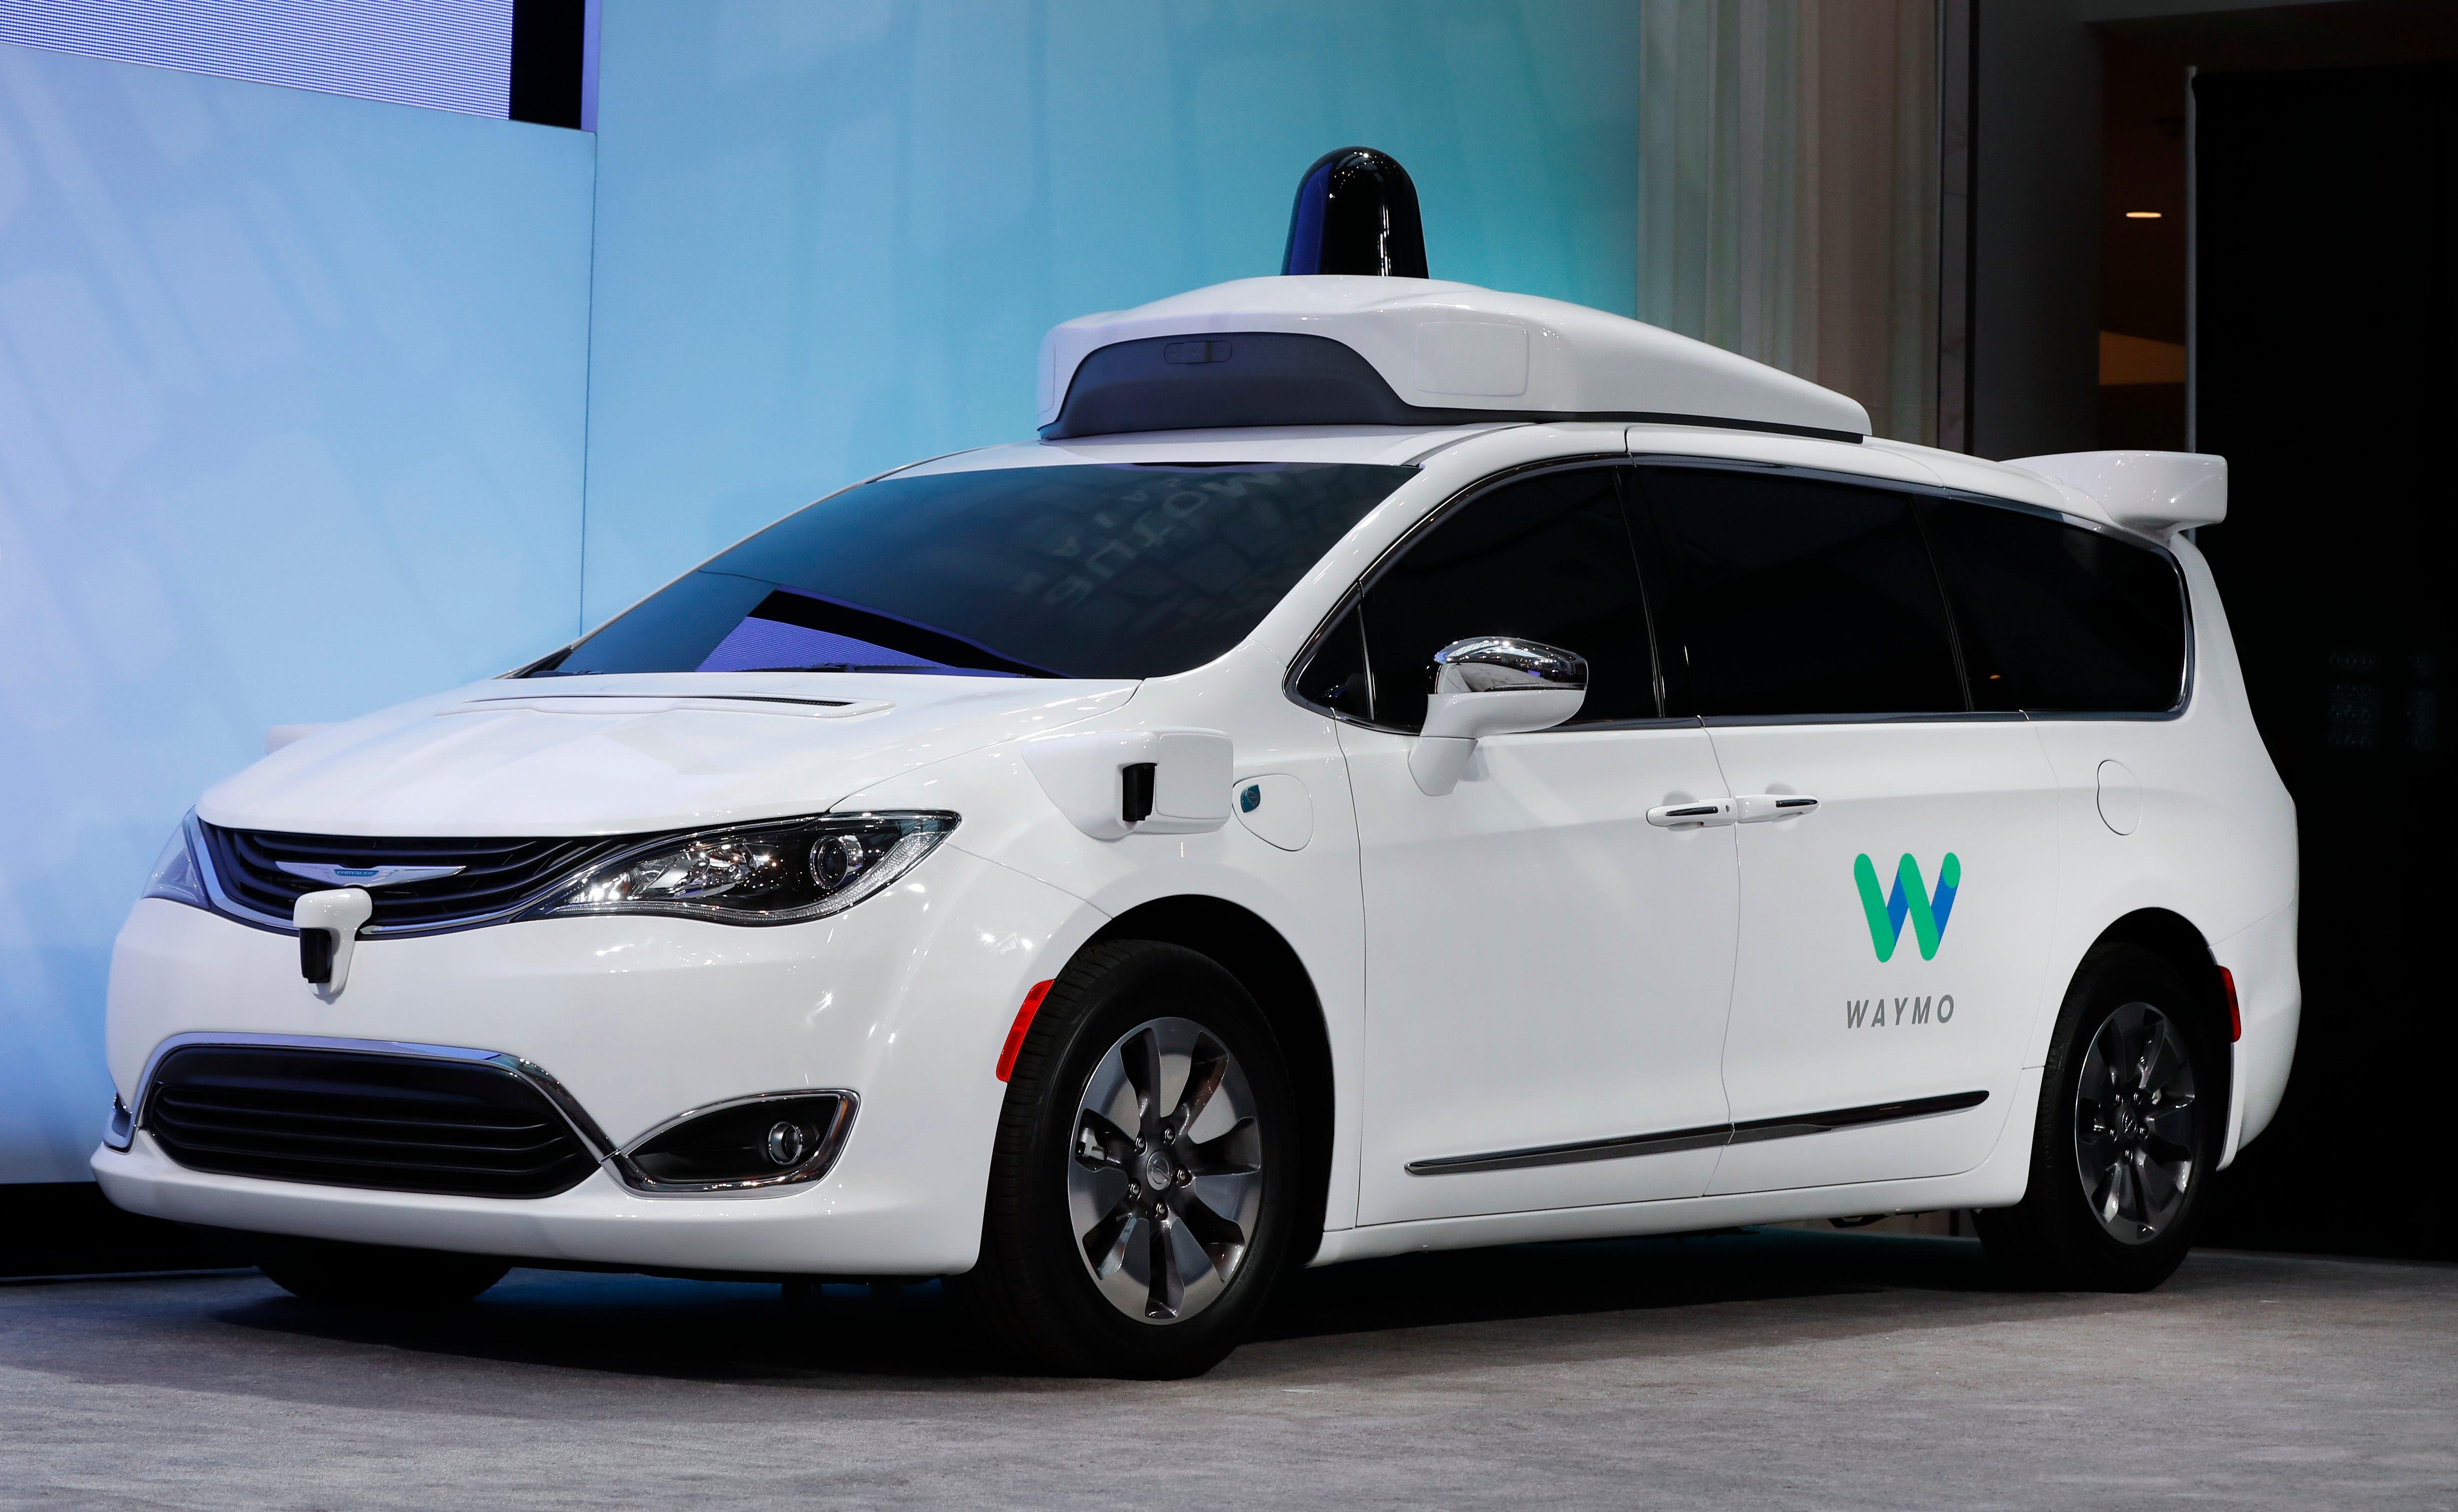 Waymo self-driving vehicle involved in Mesa crash | Arizona Central